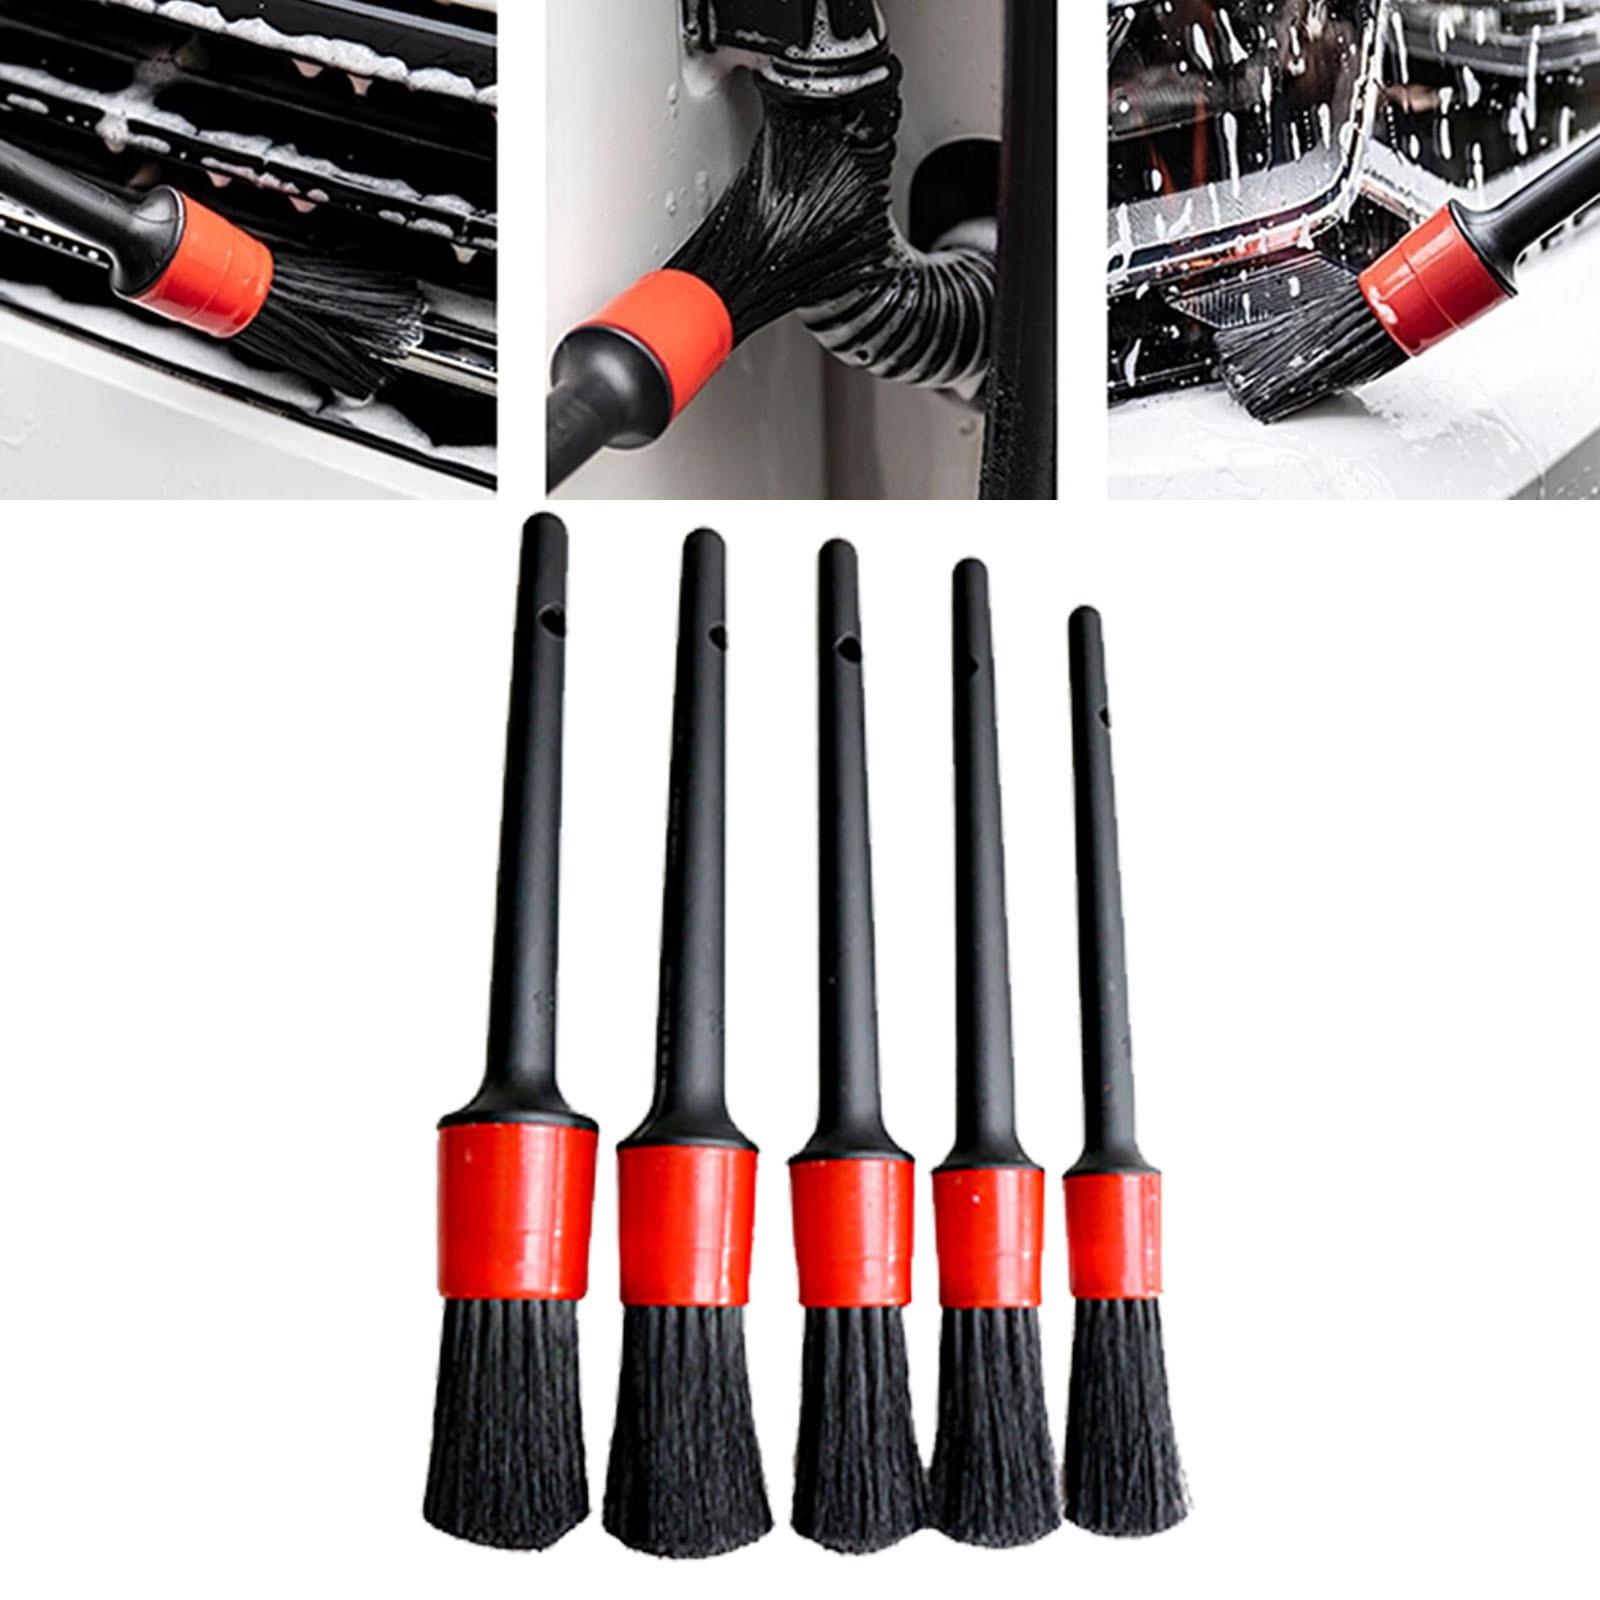 5pcs Detailing Brush Car Cleaning Detailing Brush Set Automotive Detailing Brush For Car Cleaning Auto Detail Brush Wash Tools